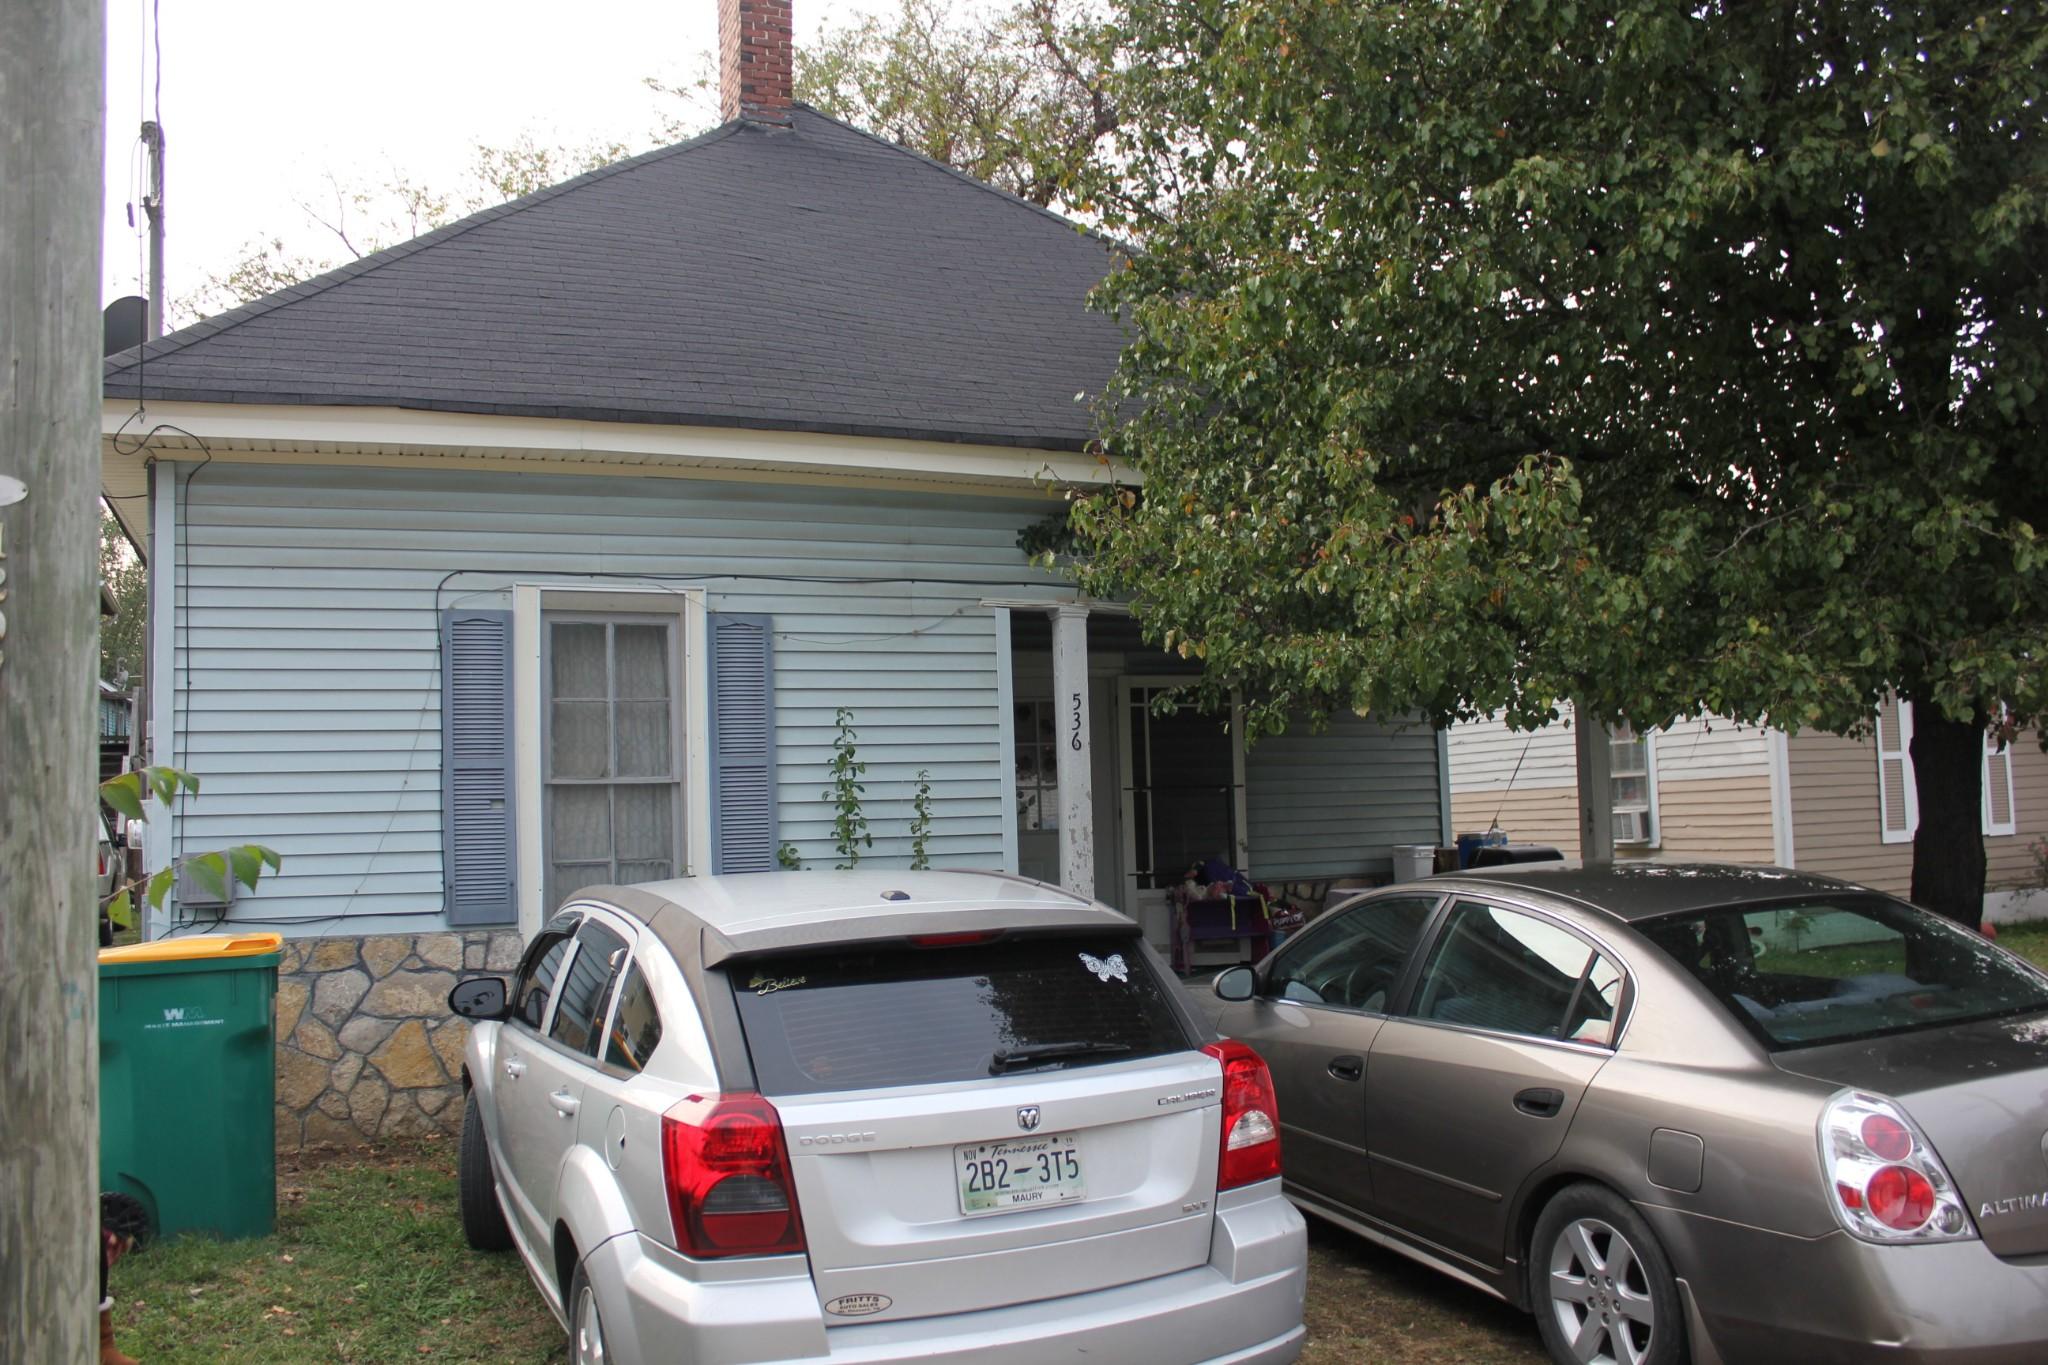 536 4th Ave, N, Lewisburg, TN 37091 - Lewisburg, TN real estate listing